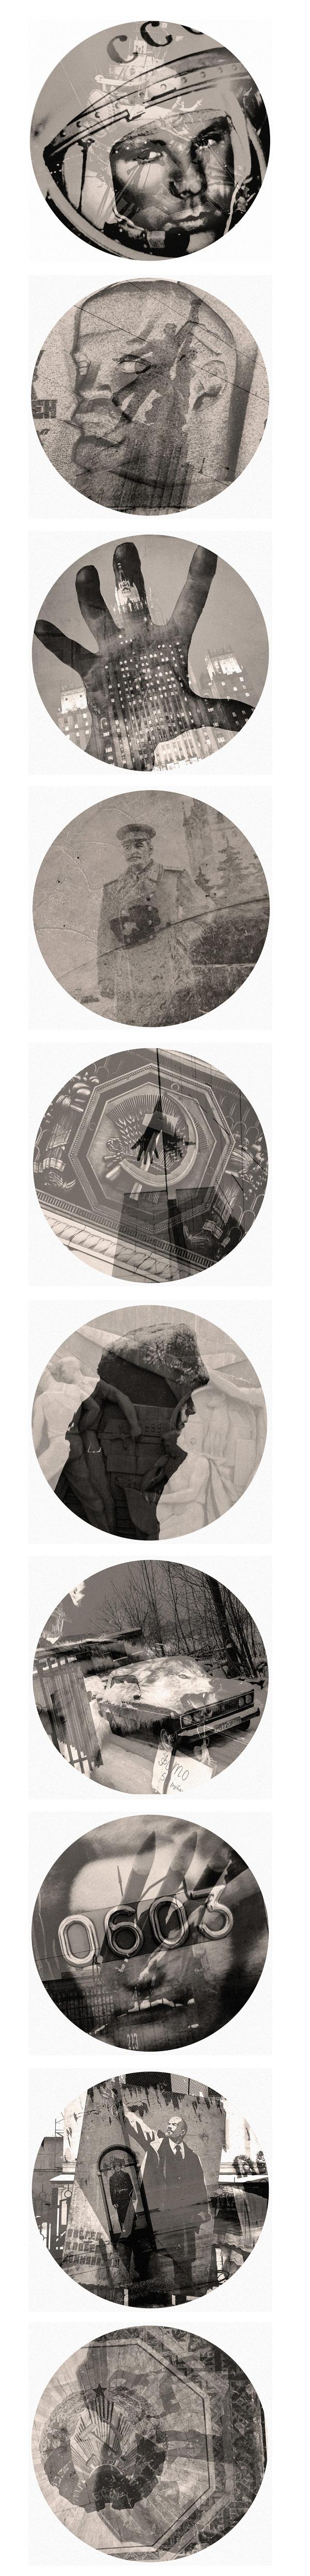 Mobile Photo: Best Photo Series, Soviet, © Javier Arcenillas, Kolga Tbilisi Photo